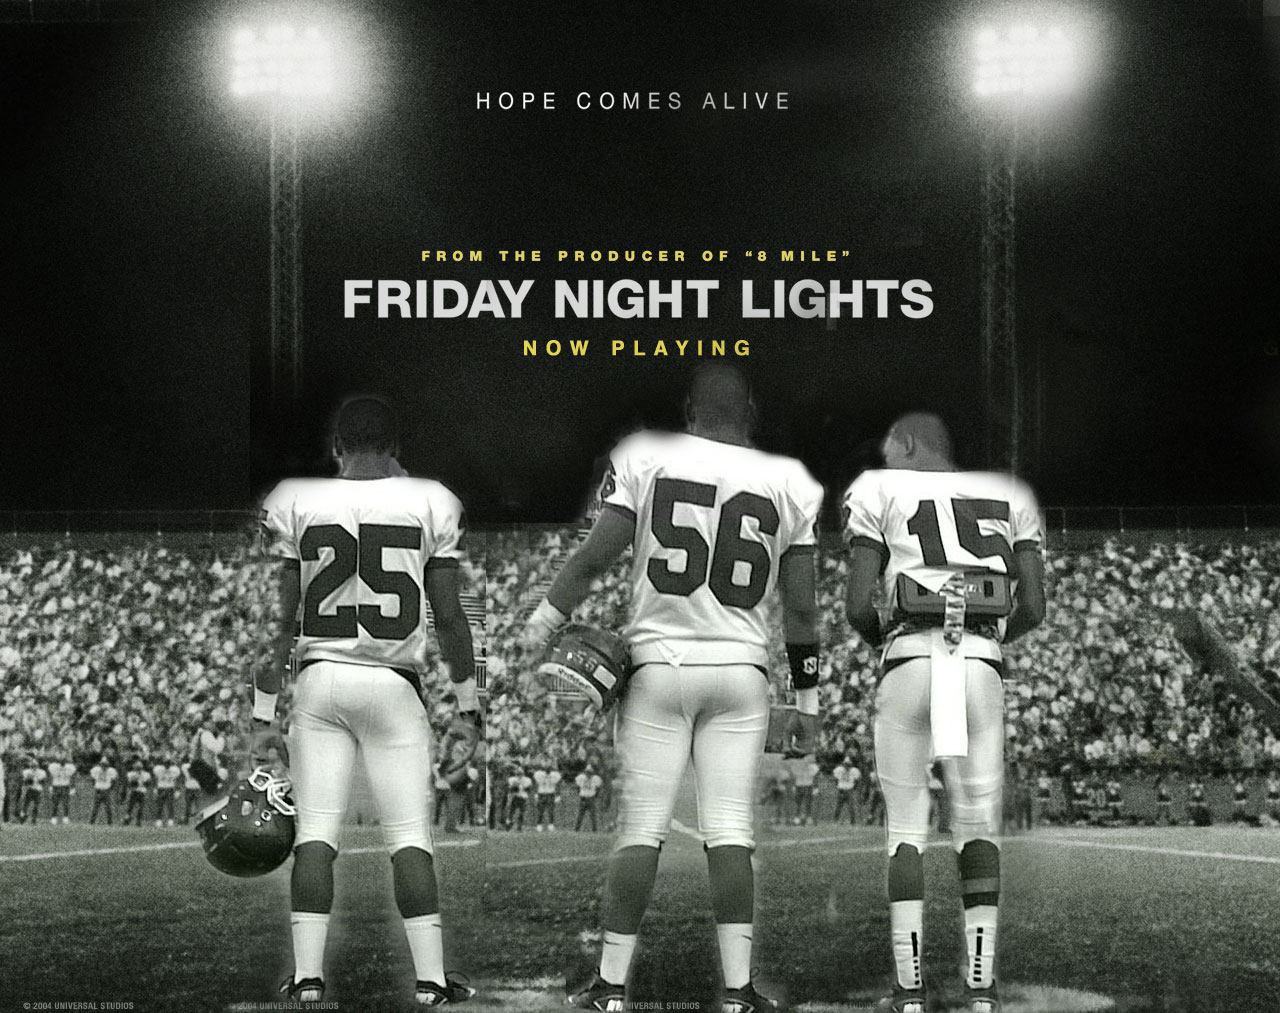 Friday Night Lights Movie Cast Of Friday Night Lights Series View 1280x1013